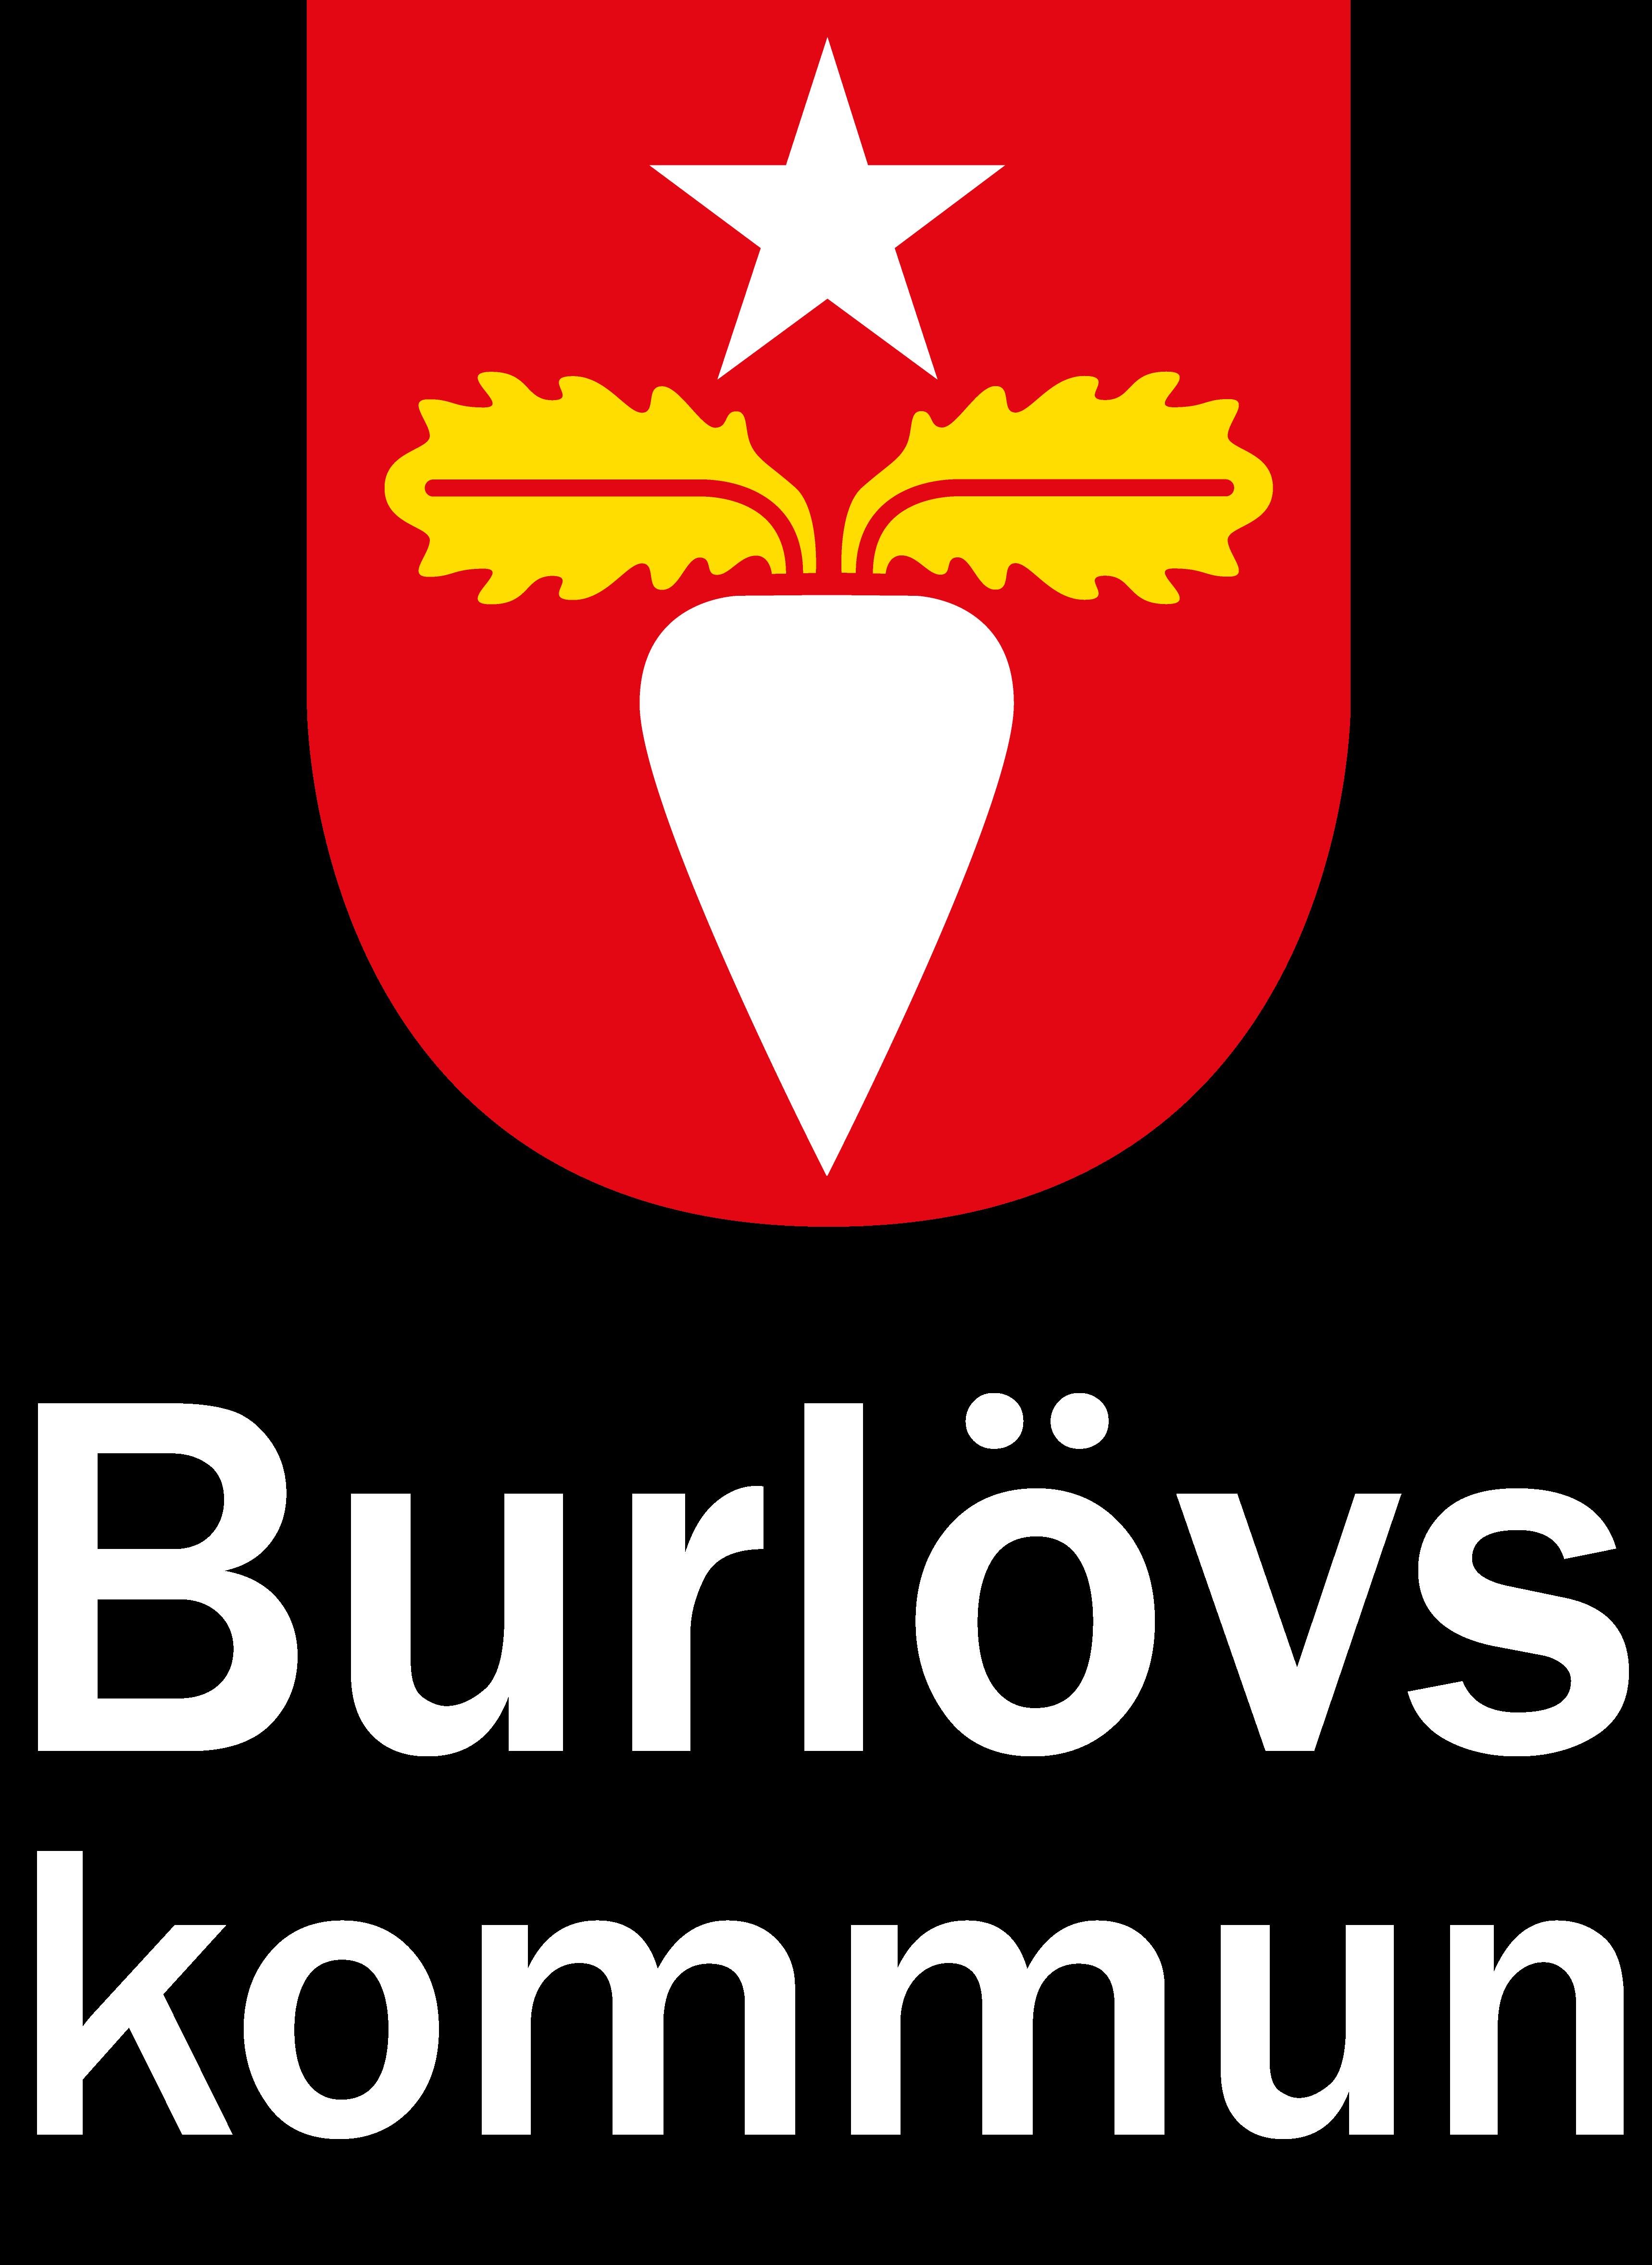 Burlov Event